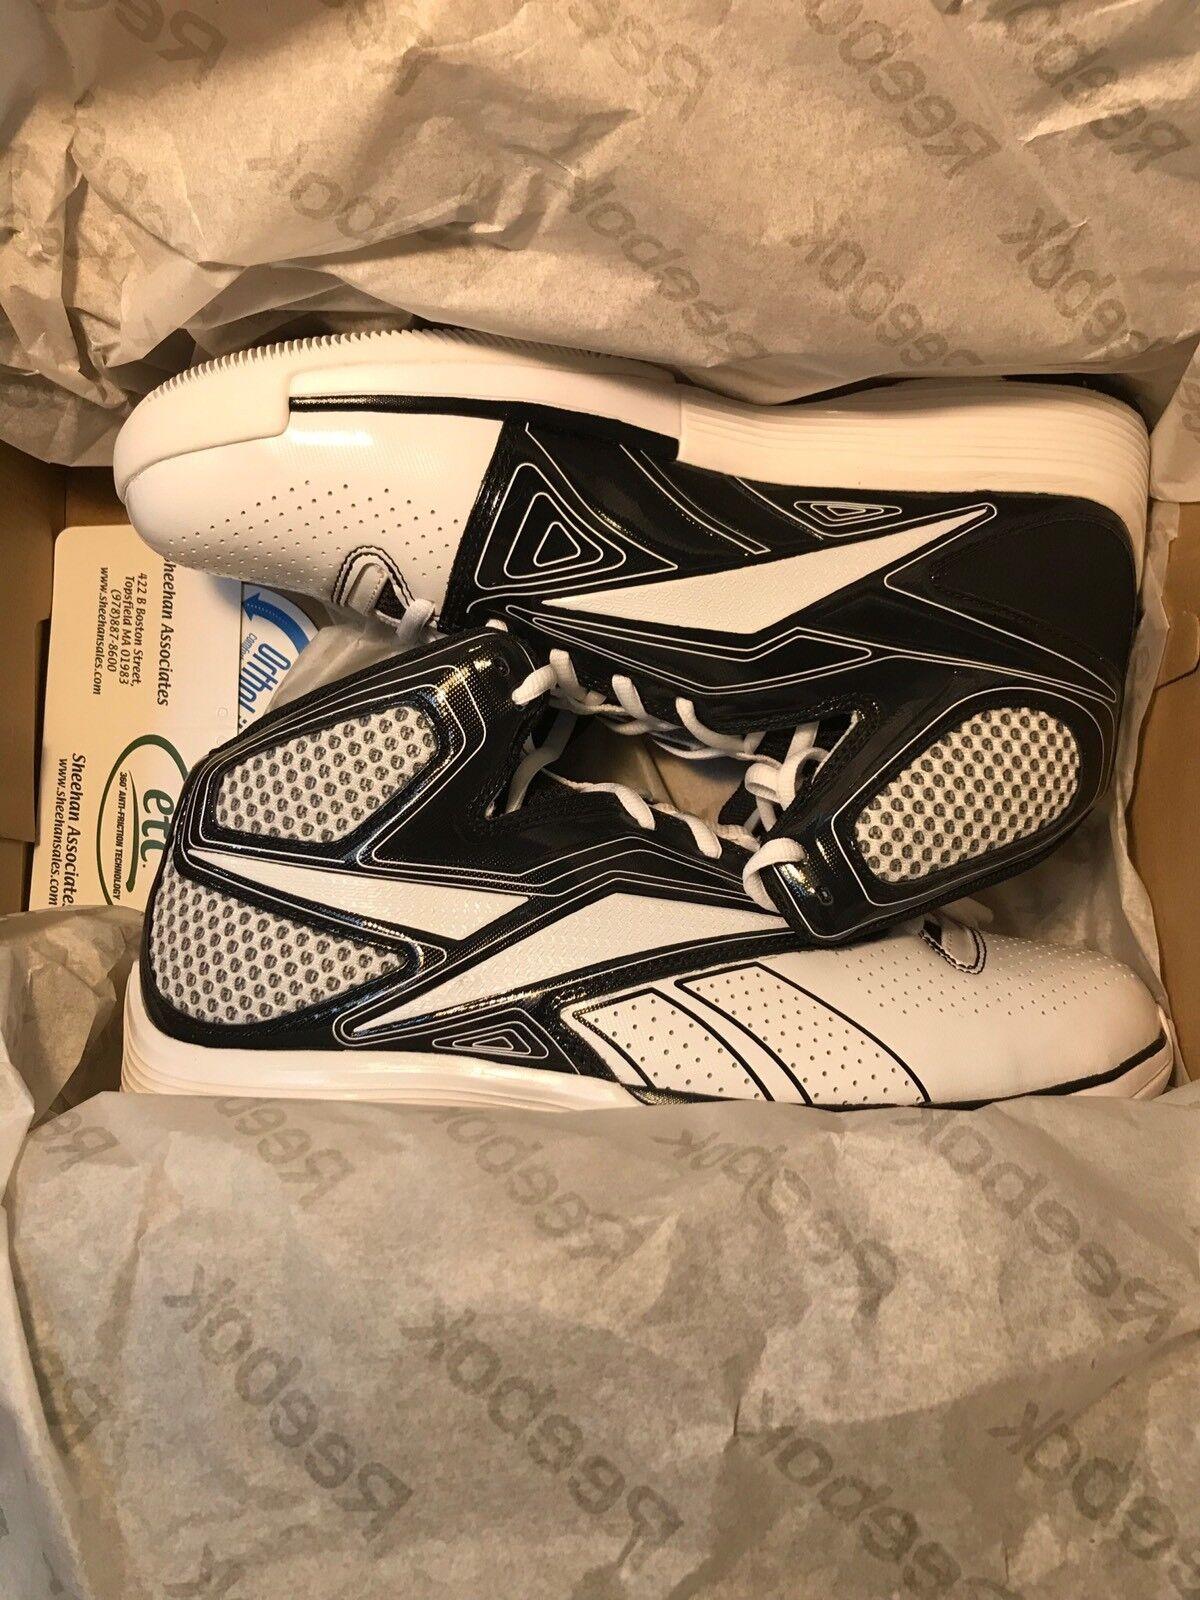 New Reebok Tempo Hexride Basketball Schuhes, Größe 8.5